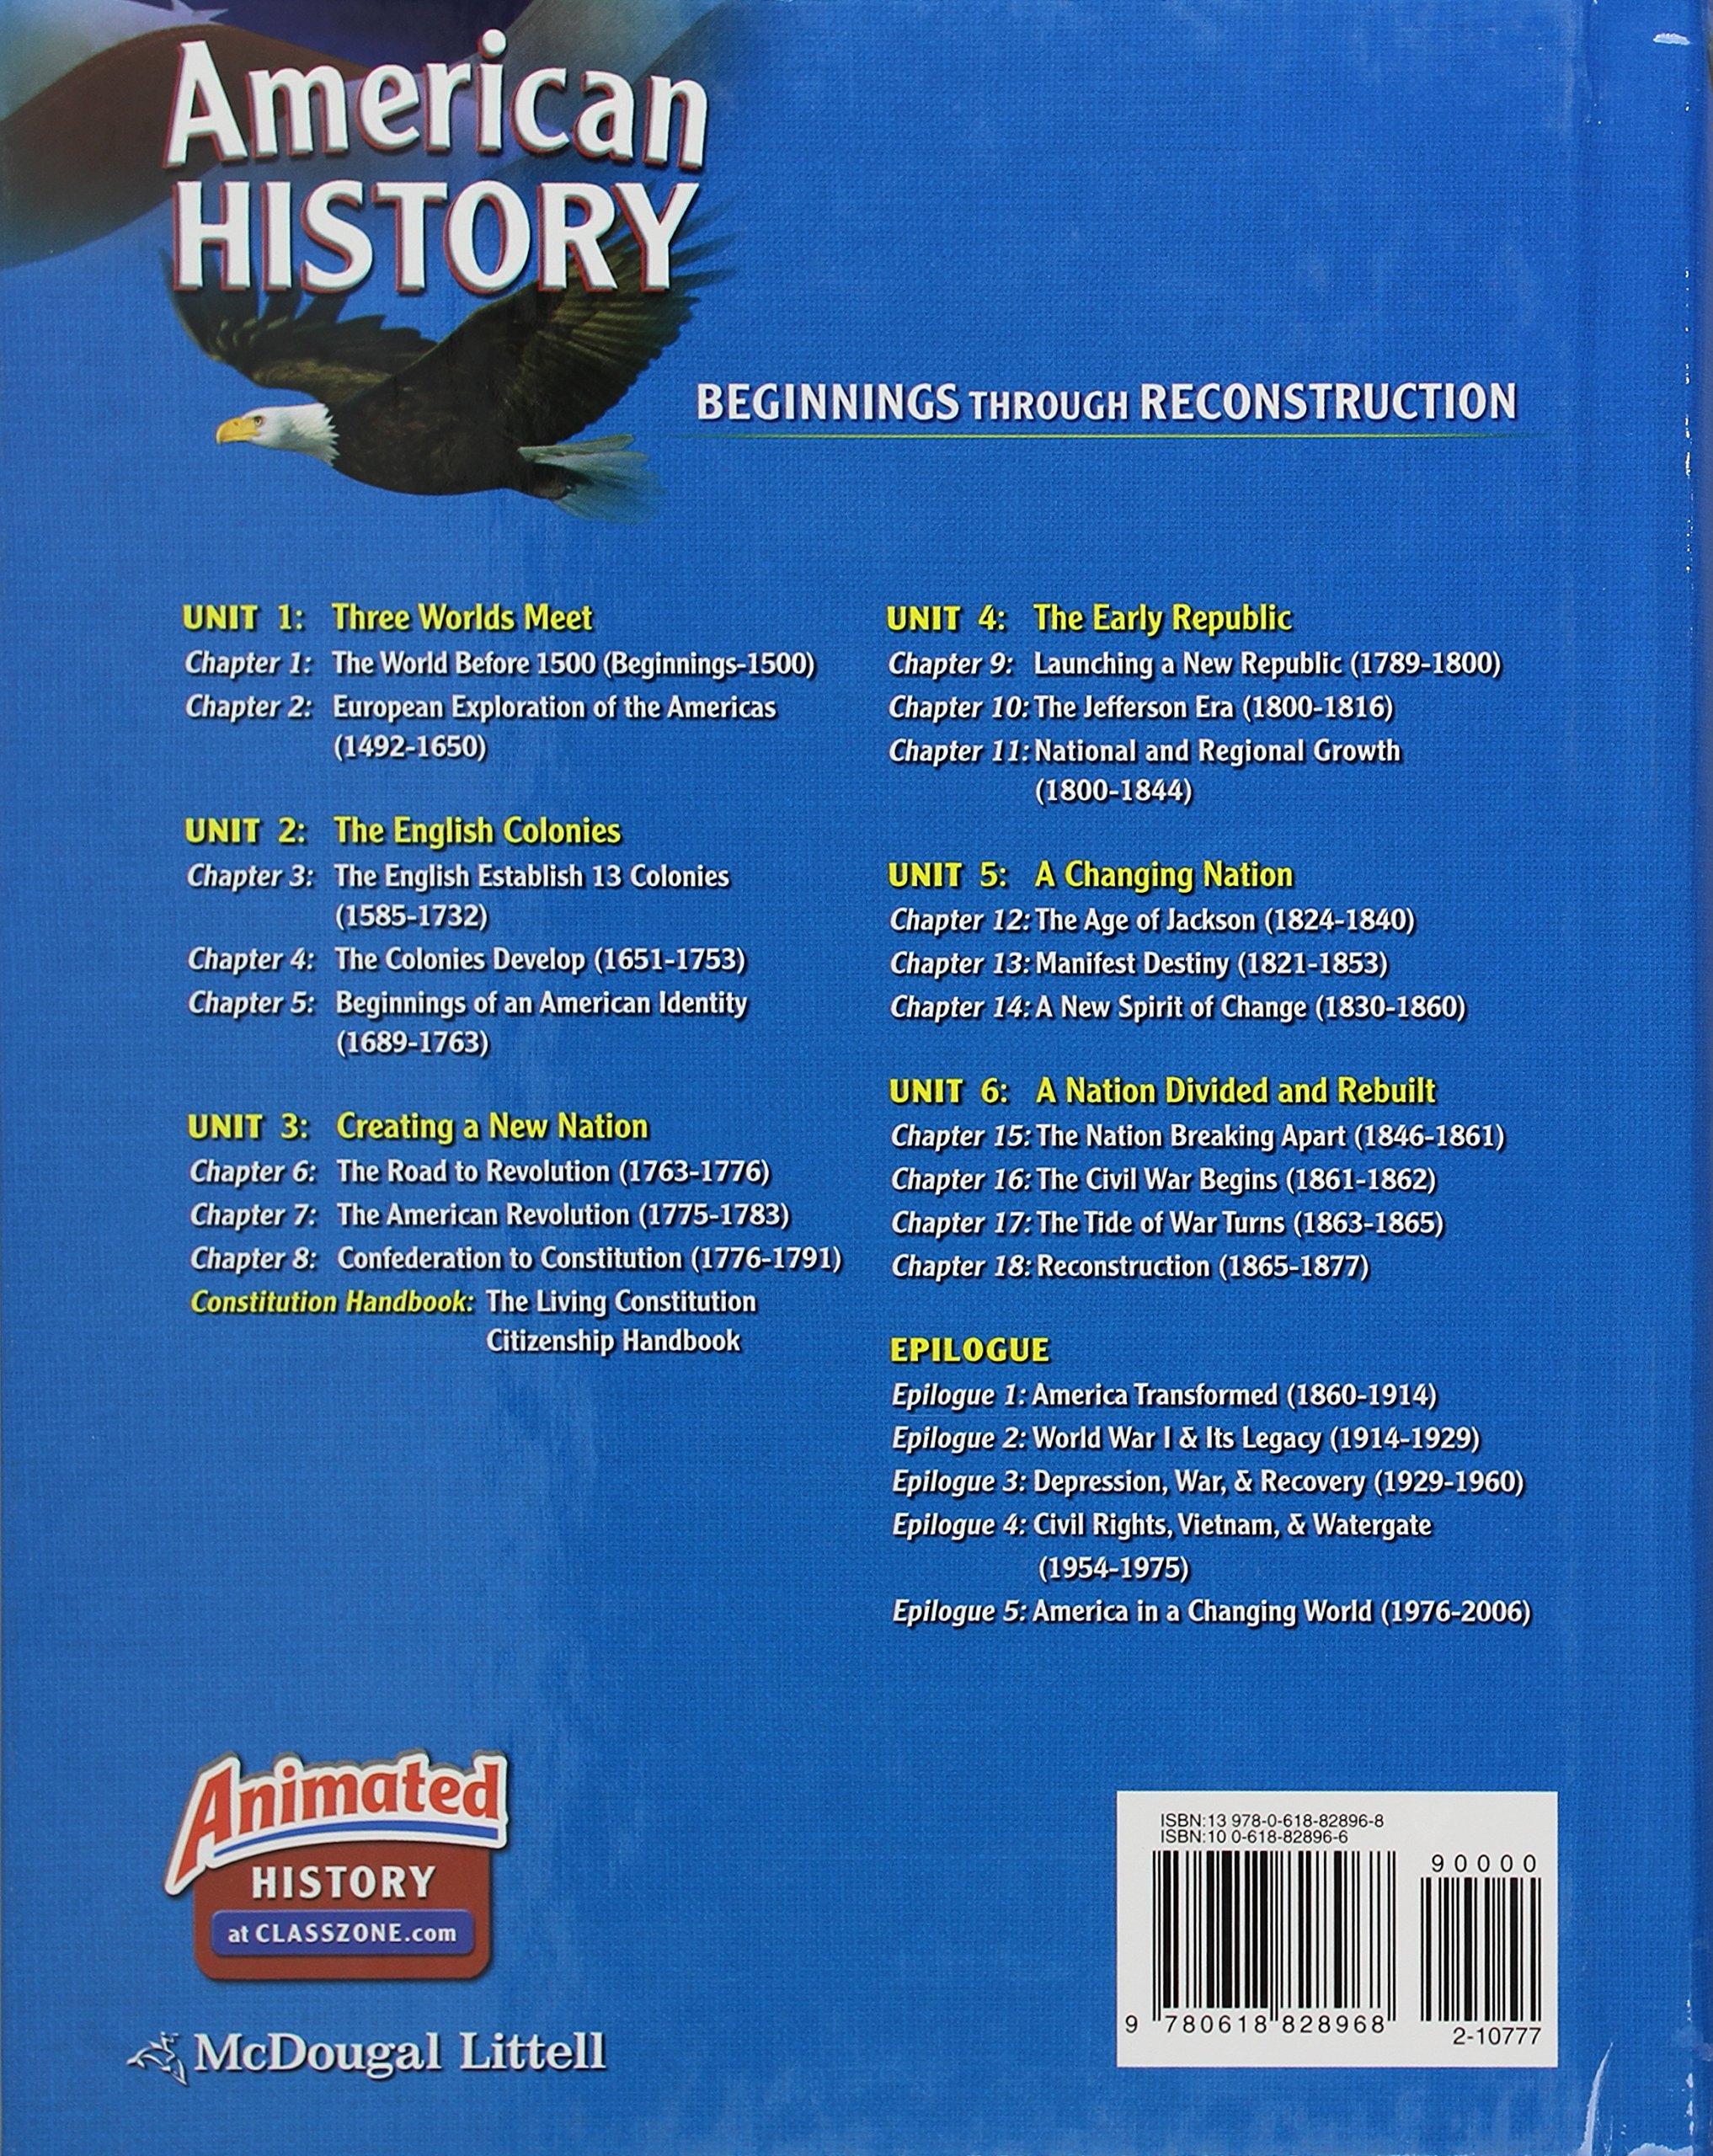 Amazon.com: McDougal Littell Middle School American History: Student  Edition Beginnings through Reconstruction 2008 (9780618828968): MCDOUGAL  LITTEL: Books